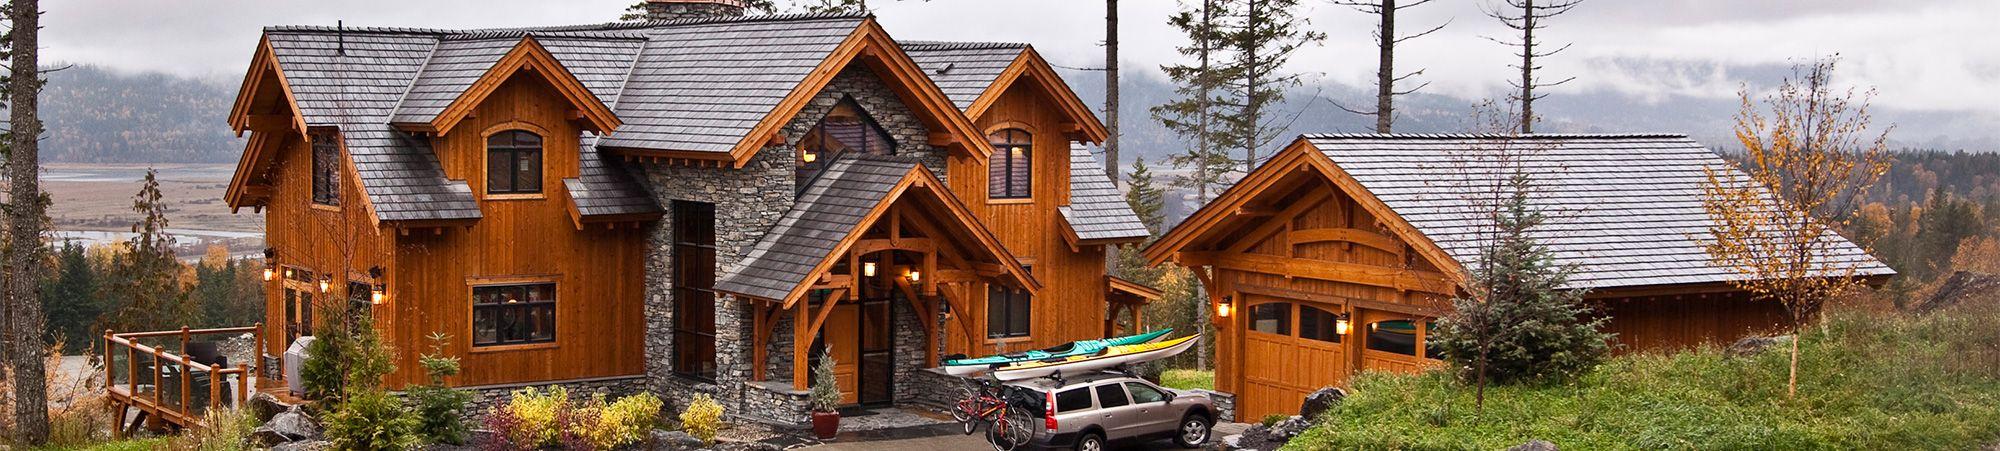 BC Canada Modern Homes Prefab Homes Timber Frame Homes Custom Home Design plete Home Packages